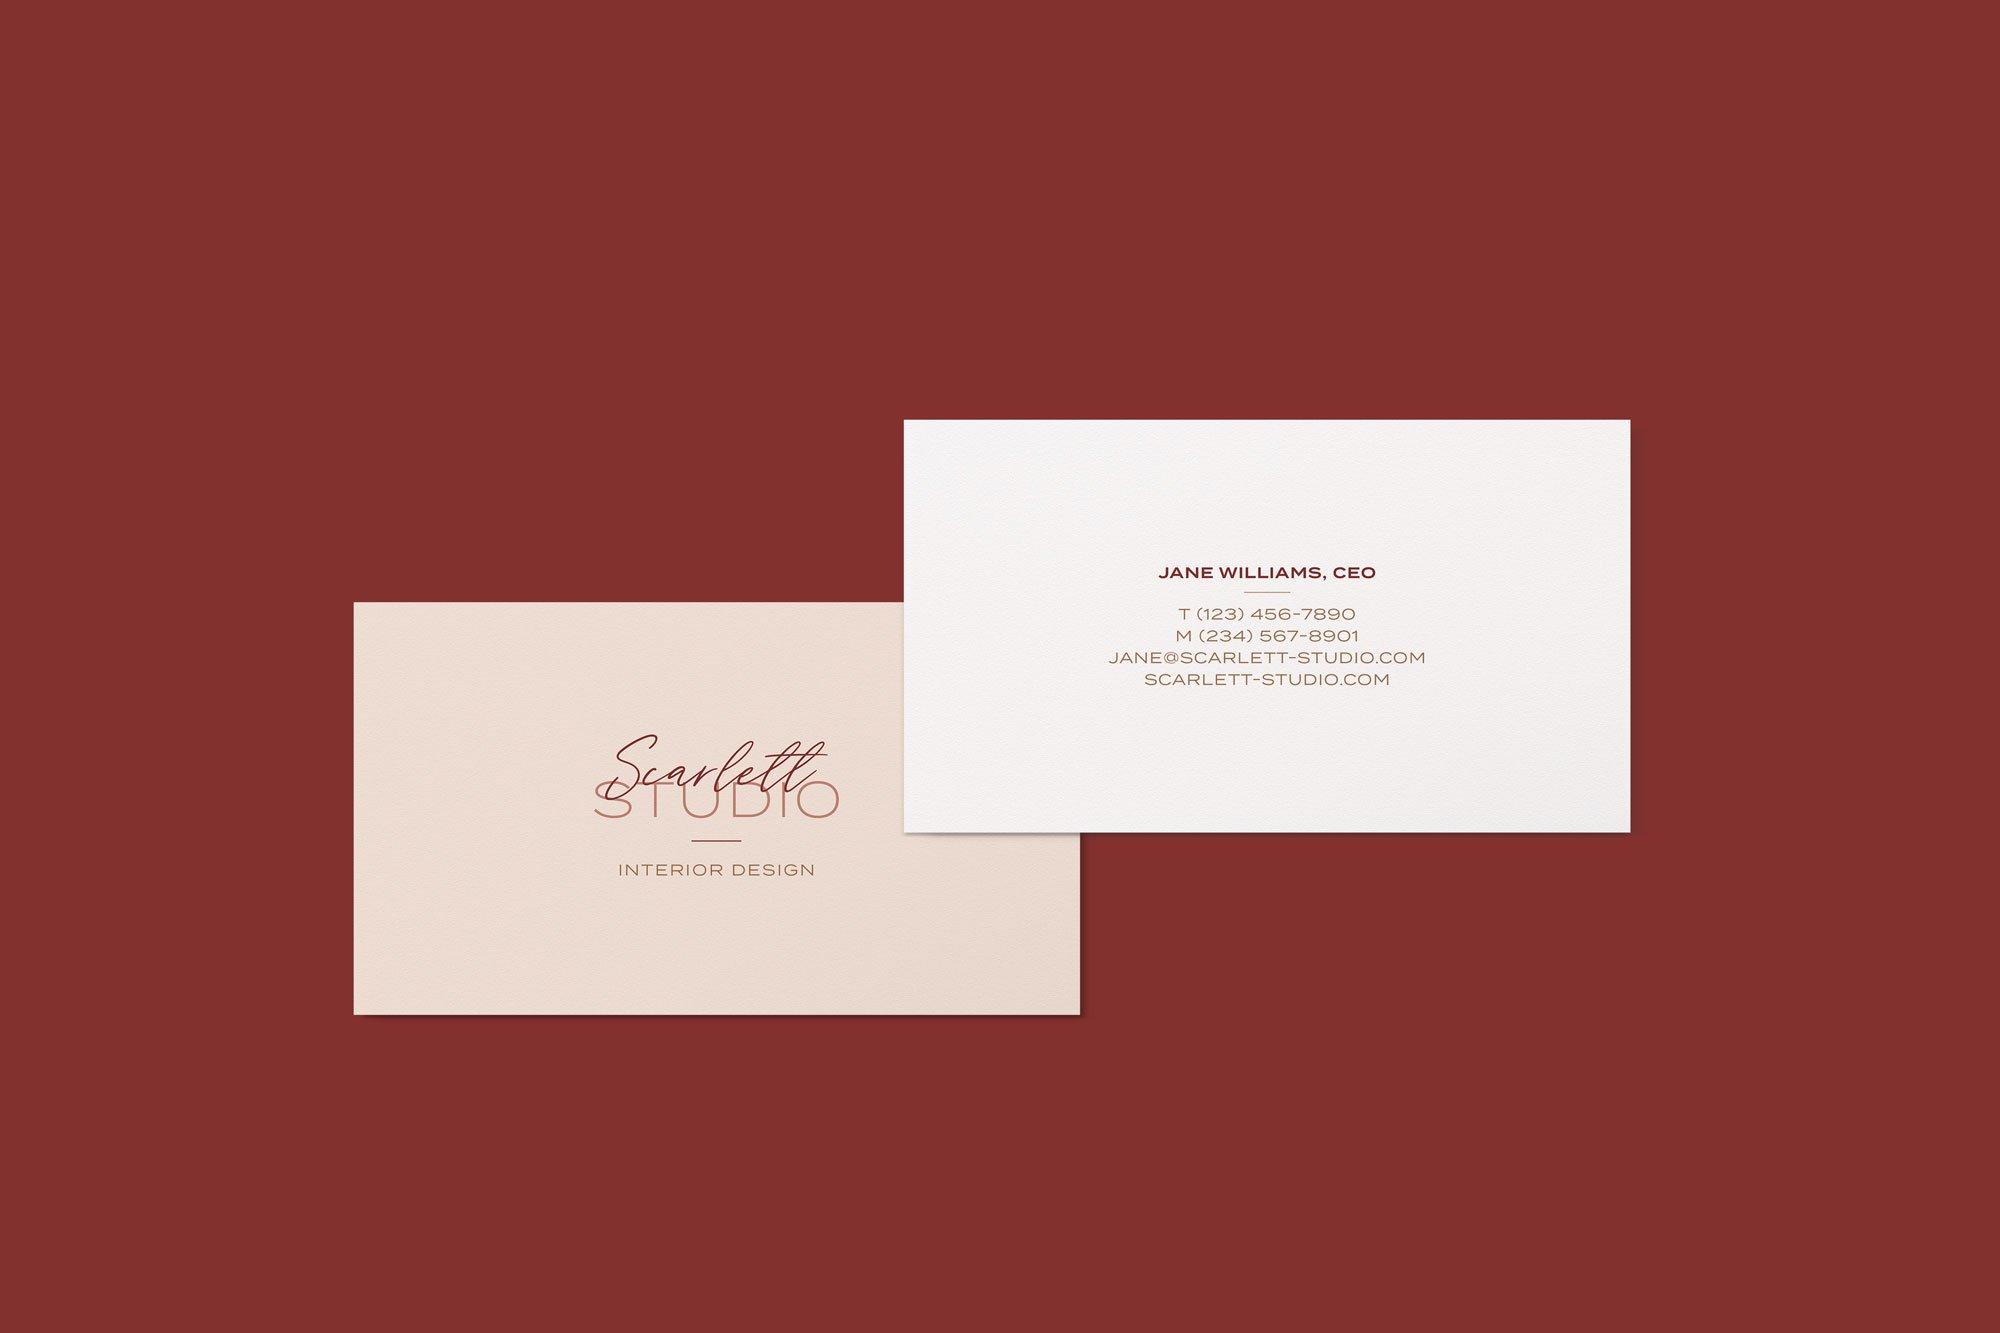 Scarlett Studio custom business card design